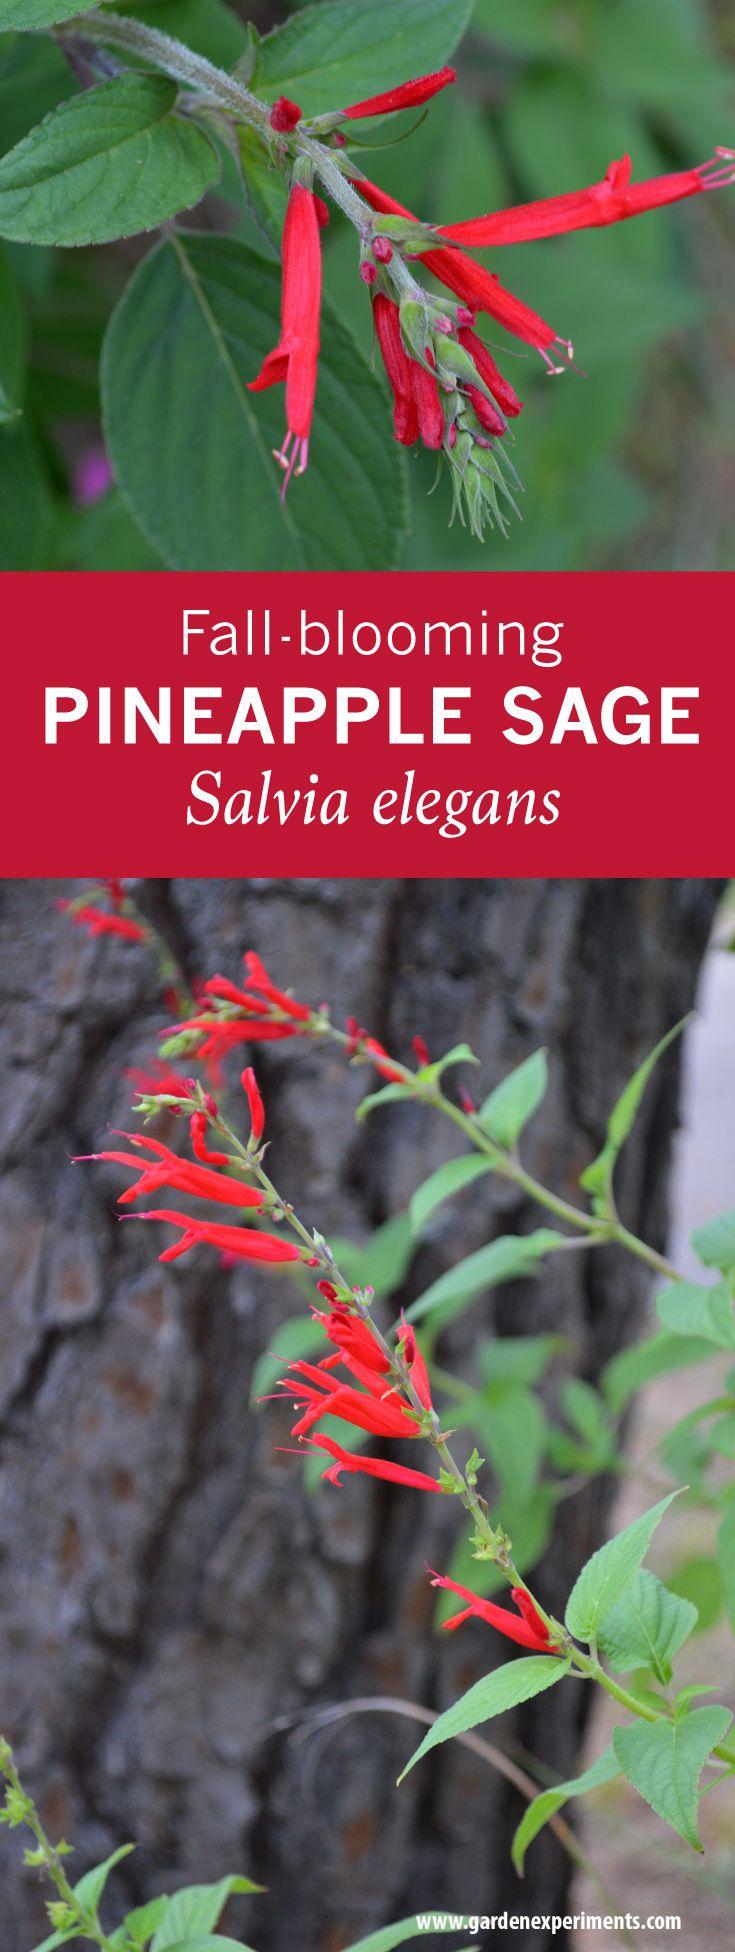 56 best Native Plants images on Pinterest   Native plants ...